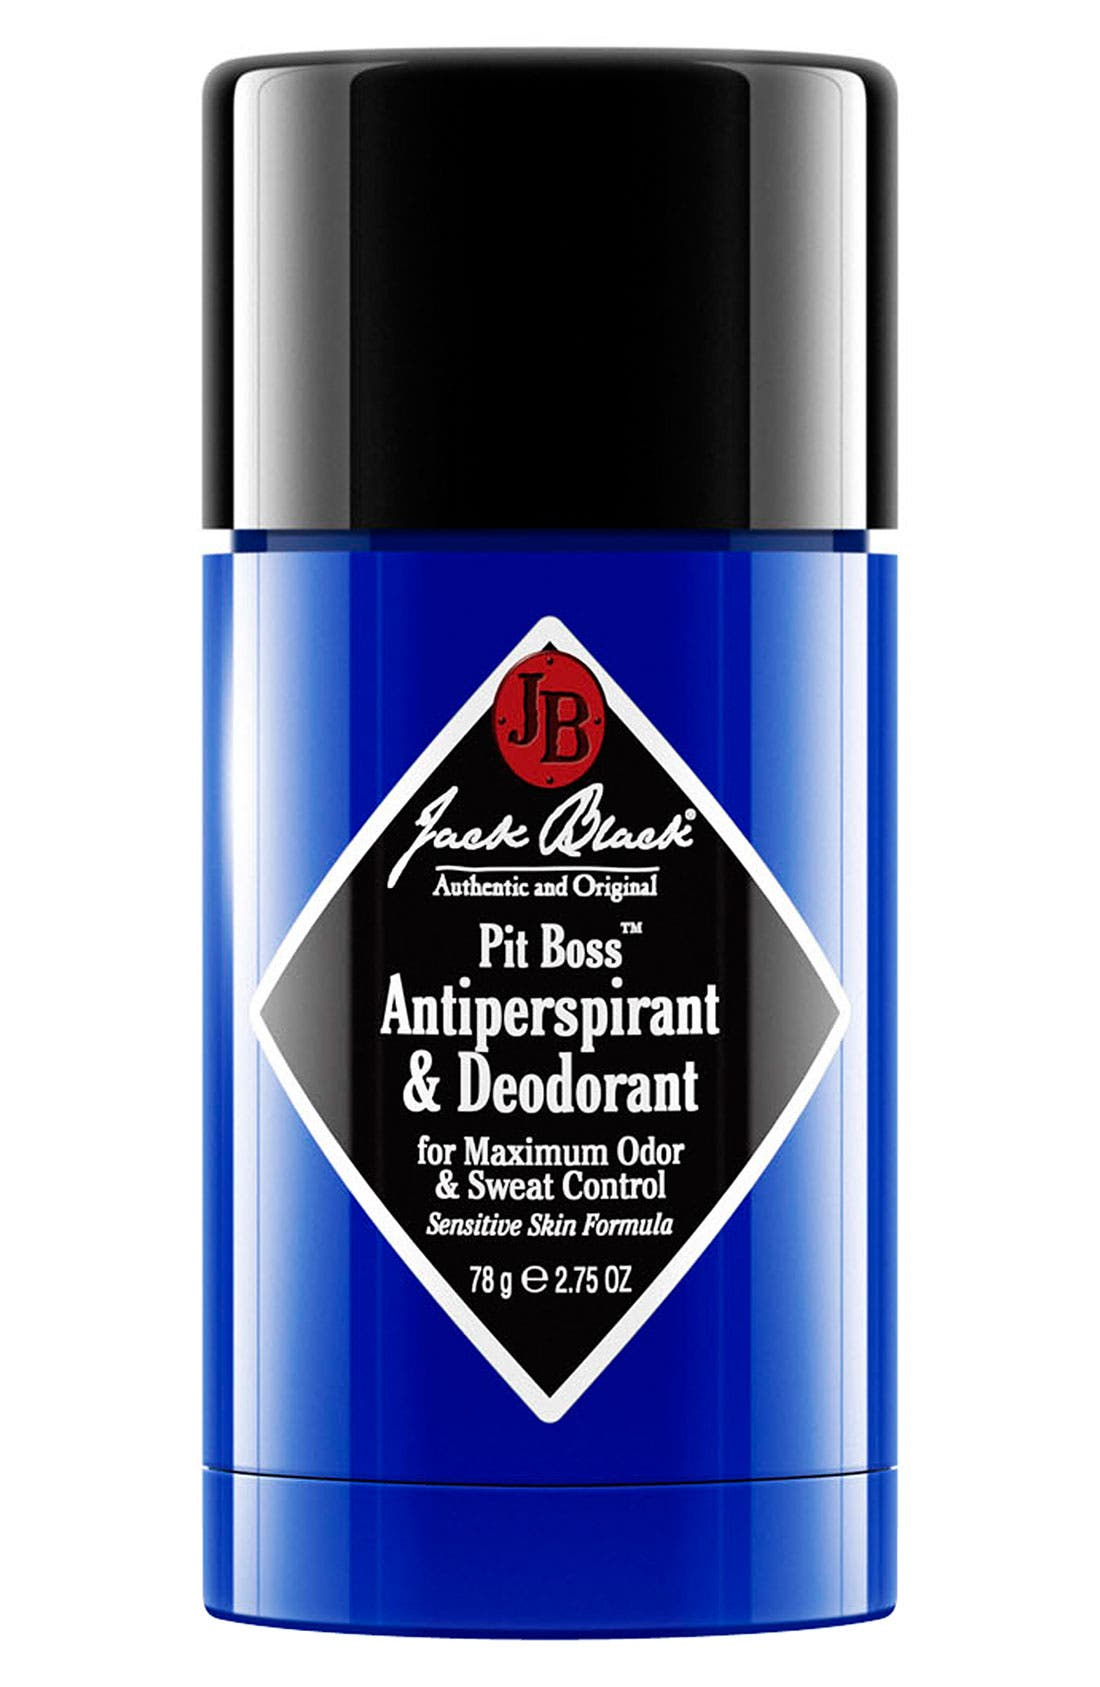 Pit Boss Antiperspirant & Deodorant,                         Main,                         color, NO COLOR